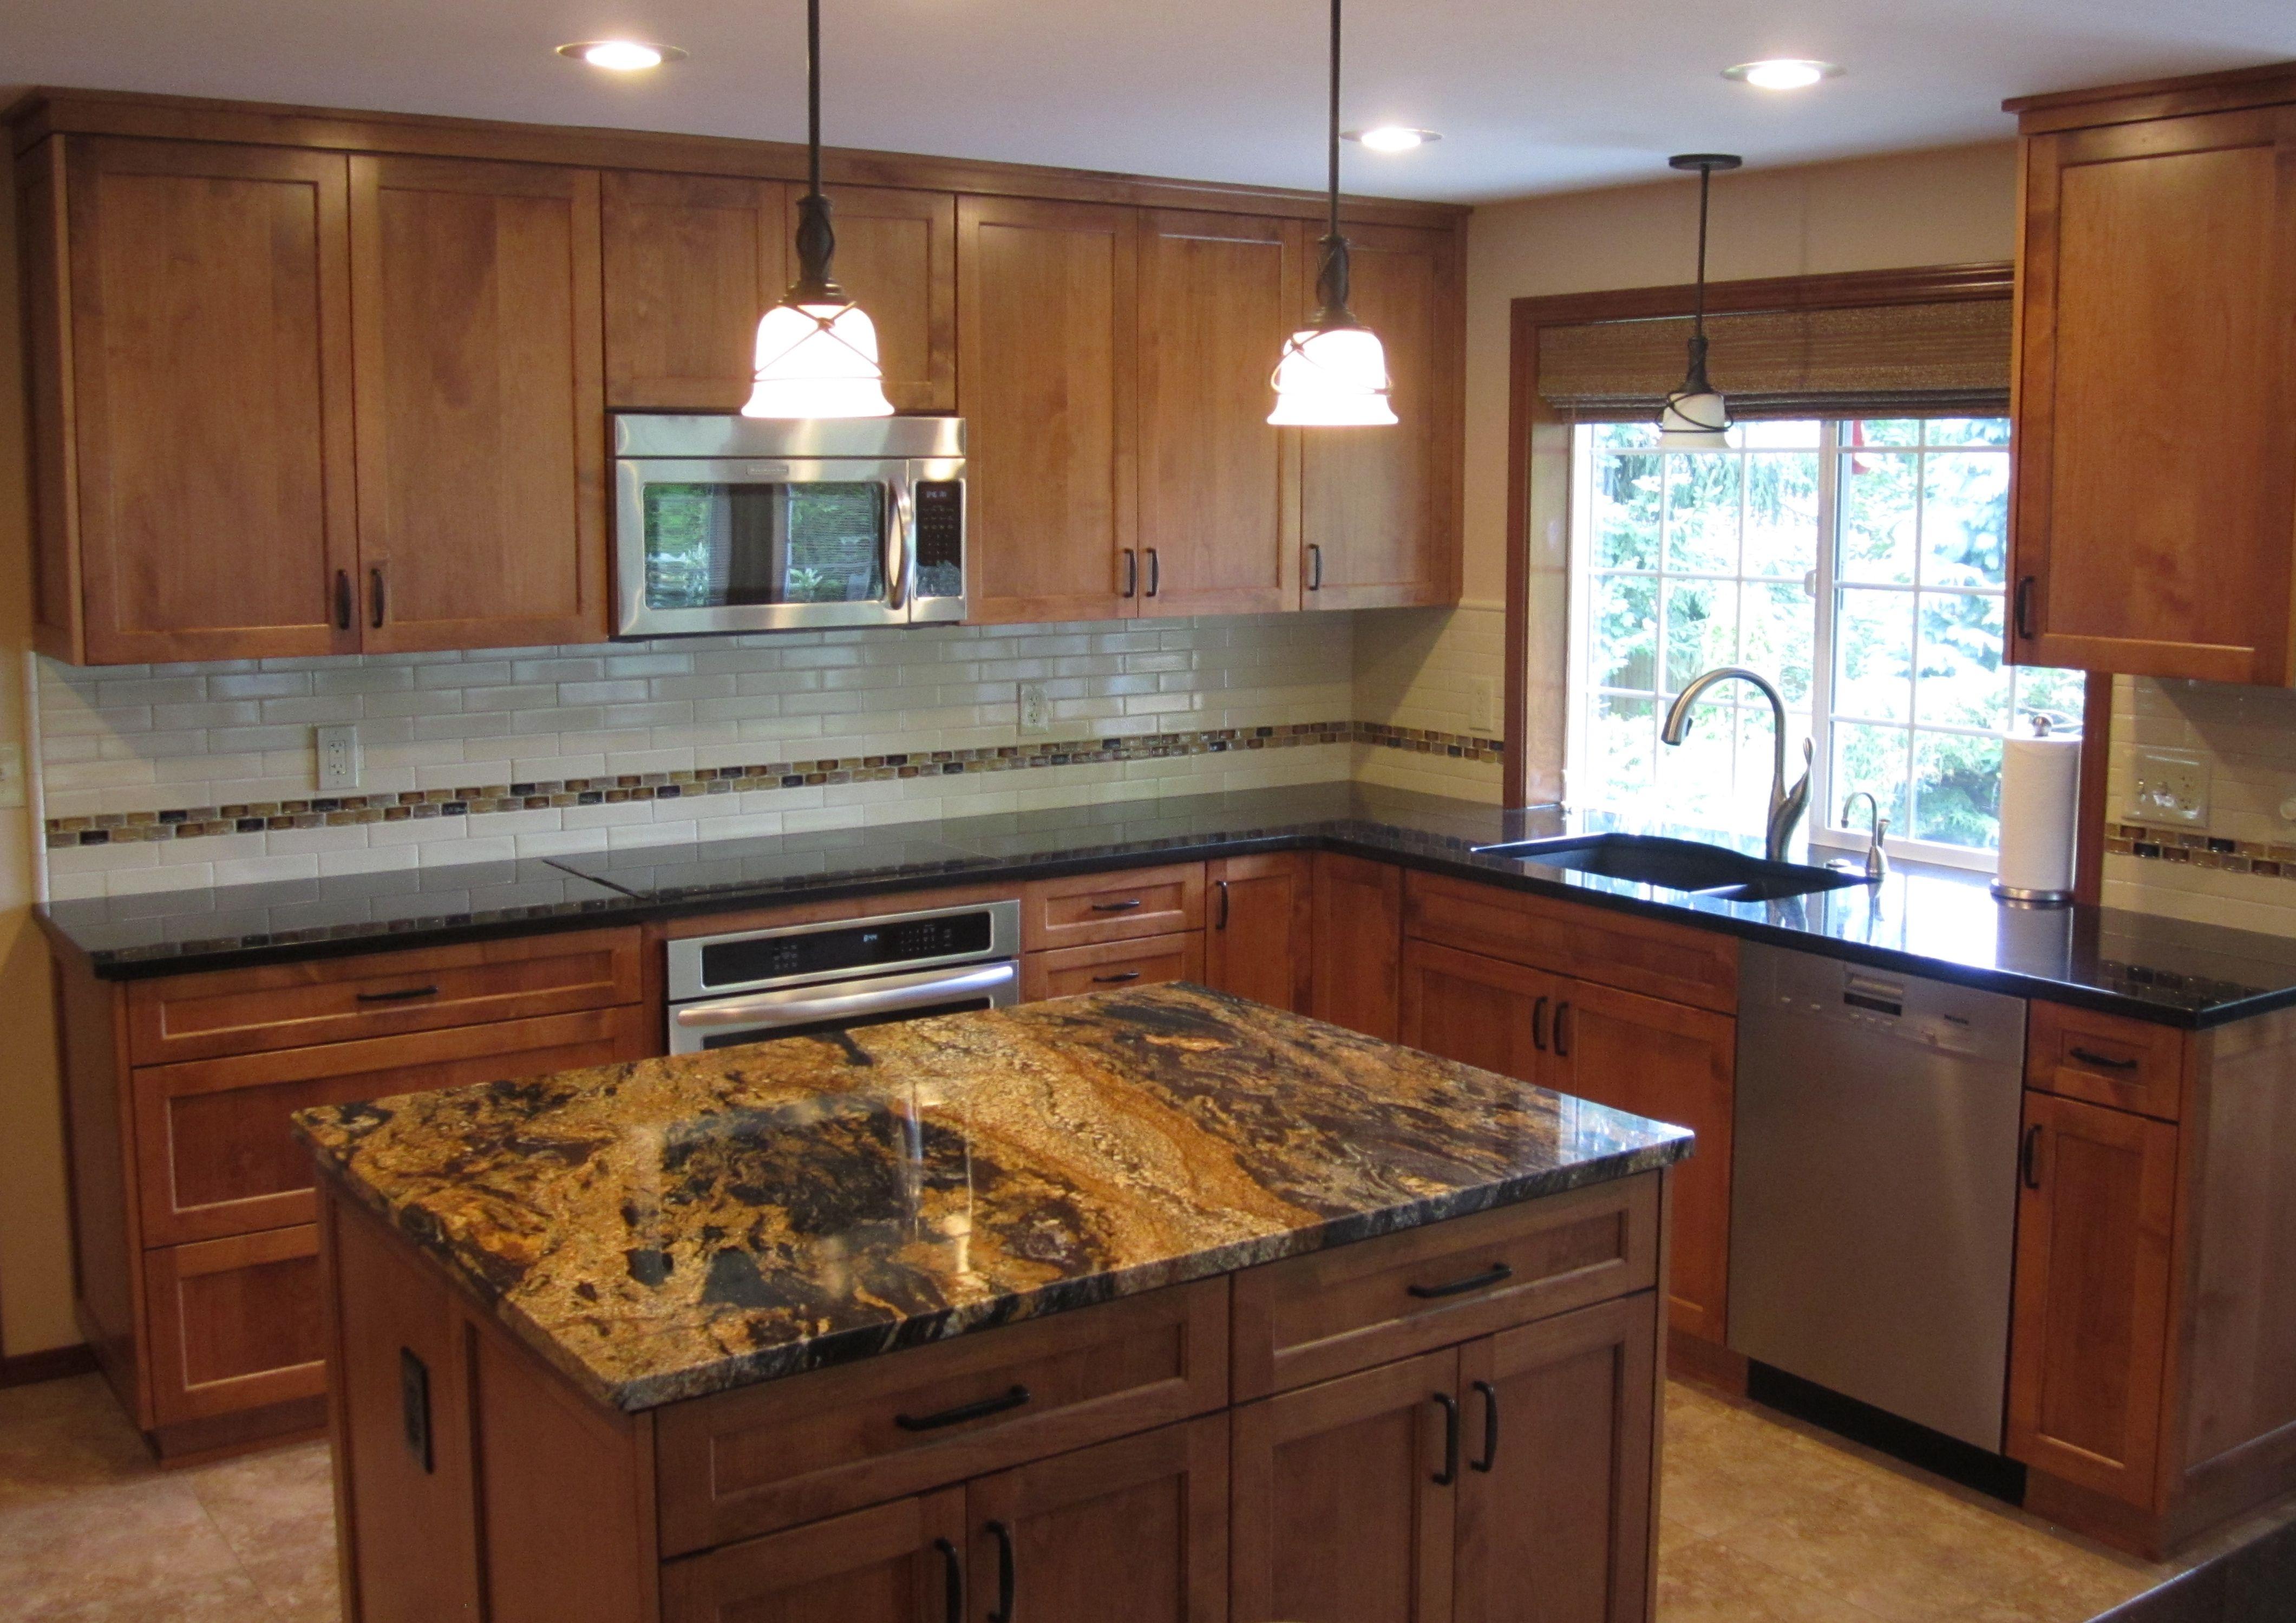 black galaxy countertops by priceless granite granite kitchen kitchen backsplash countertops on kitchen decor black countertop id=54333